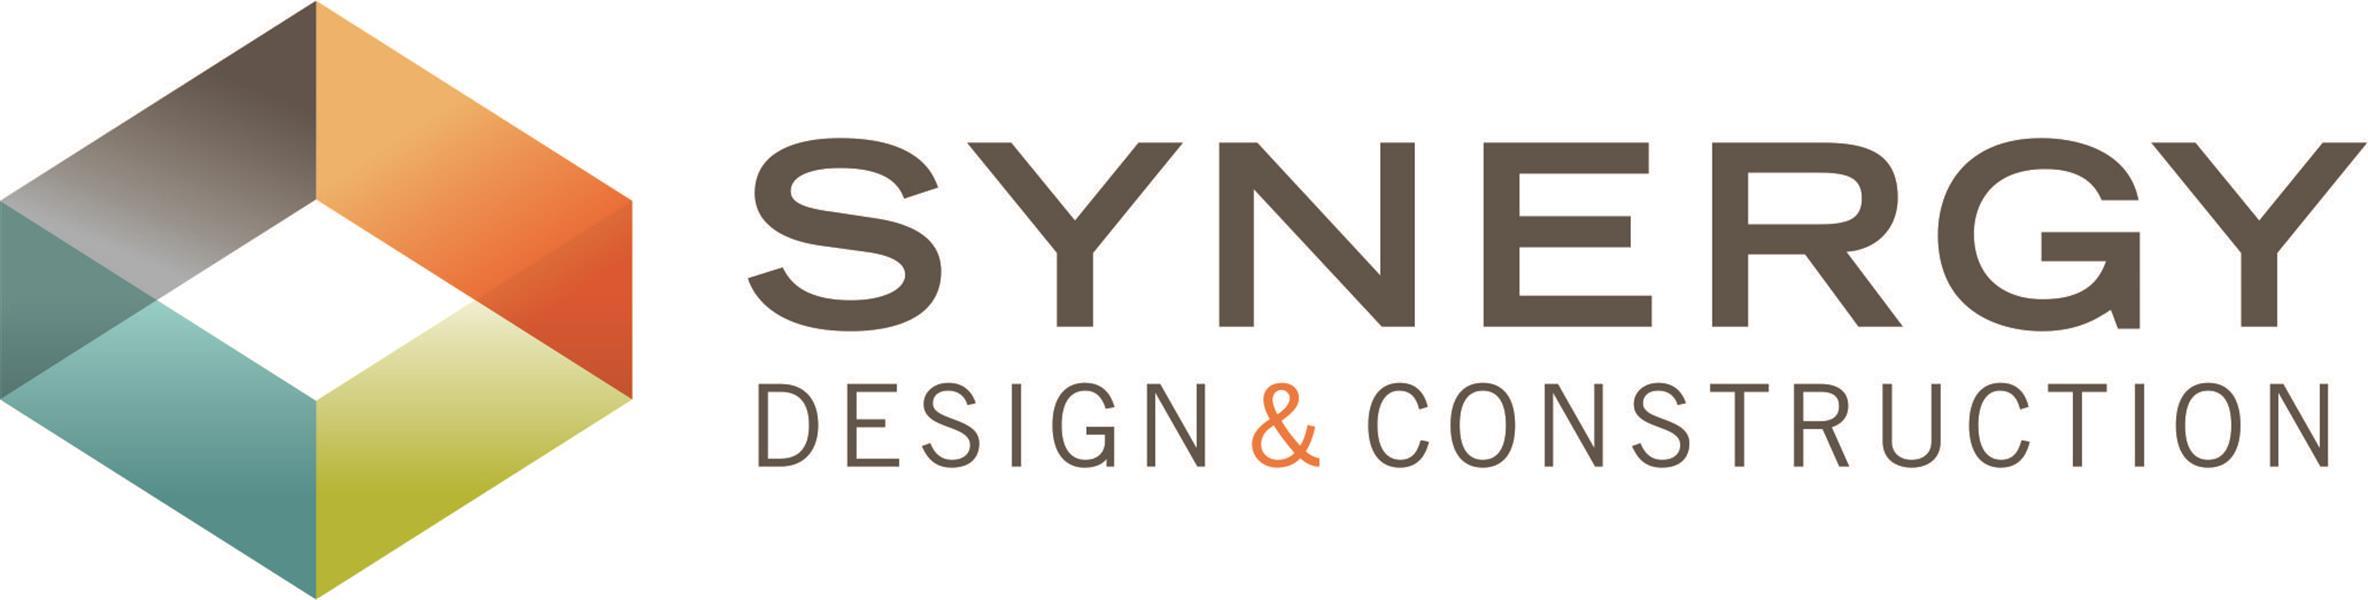 Synergy Design & Construction